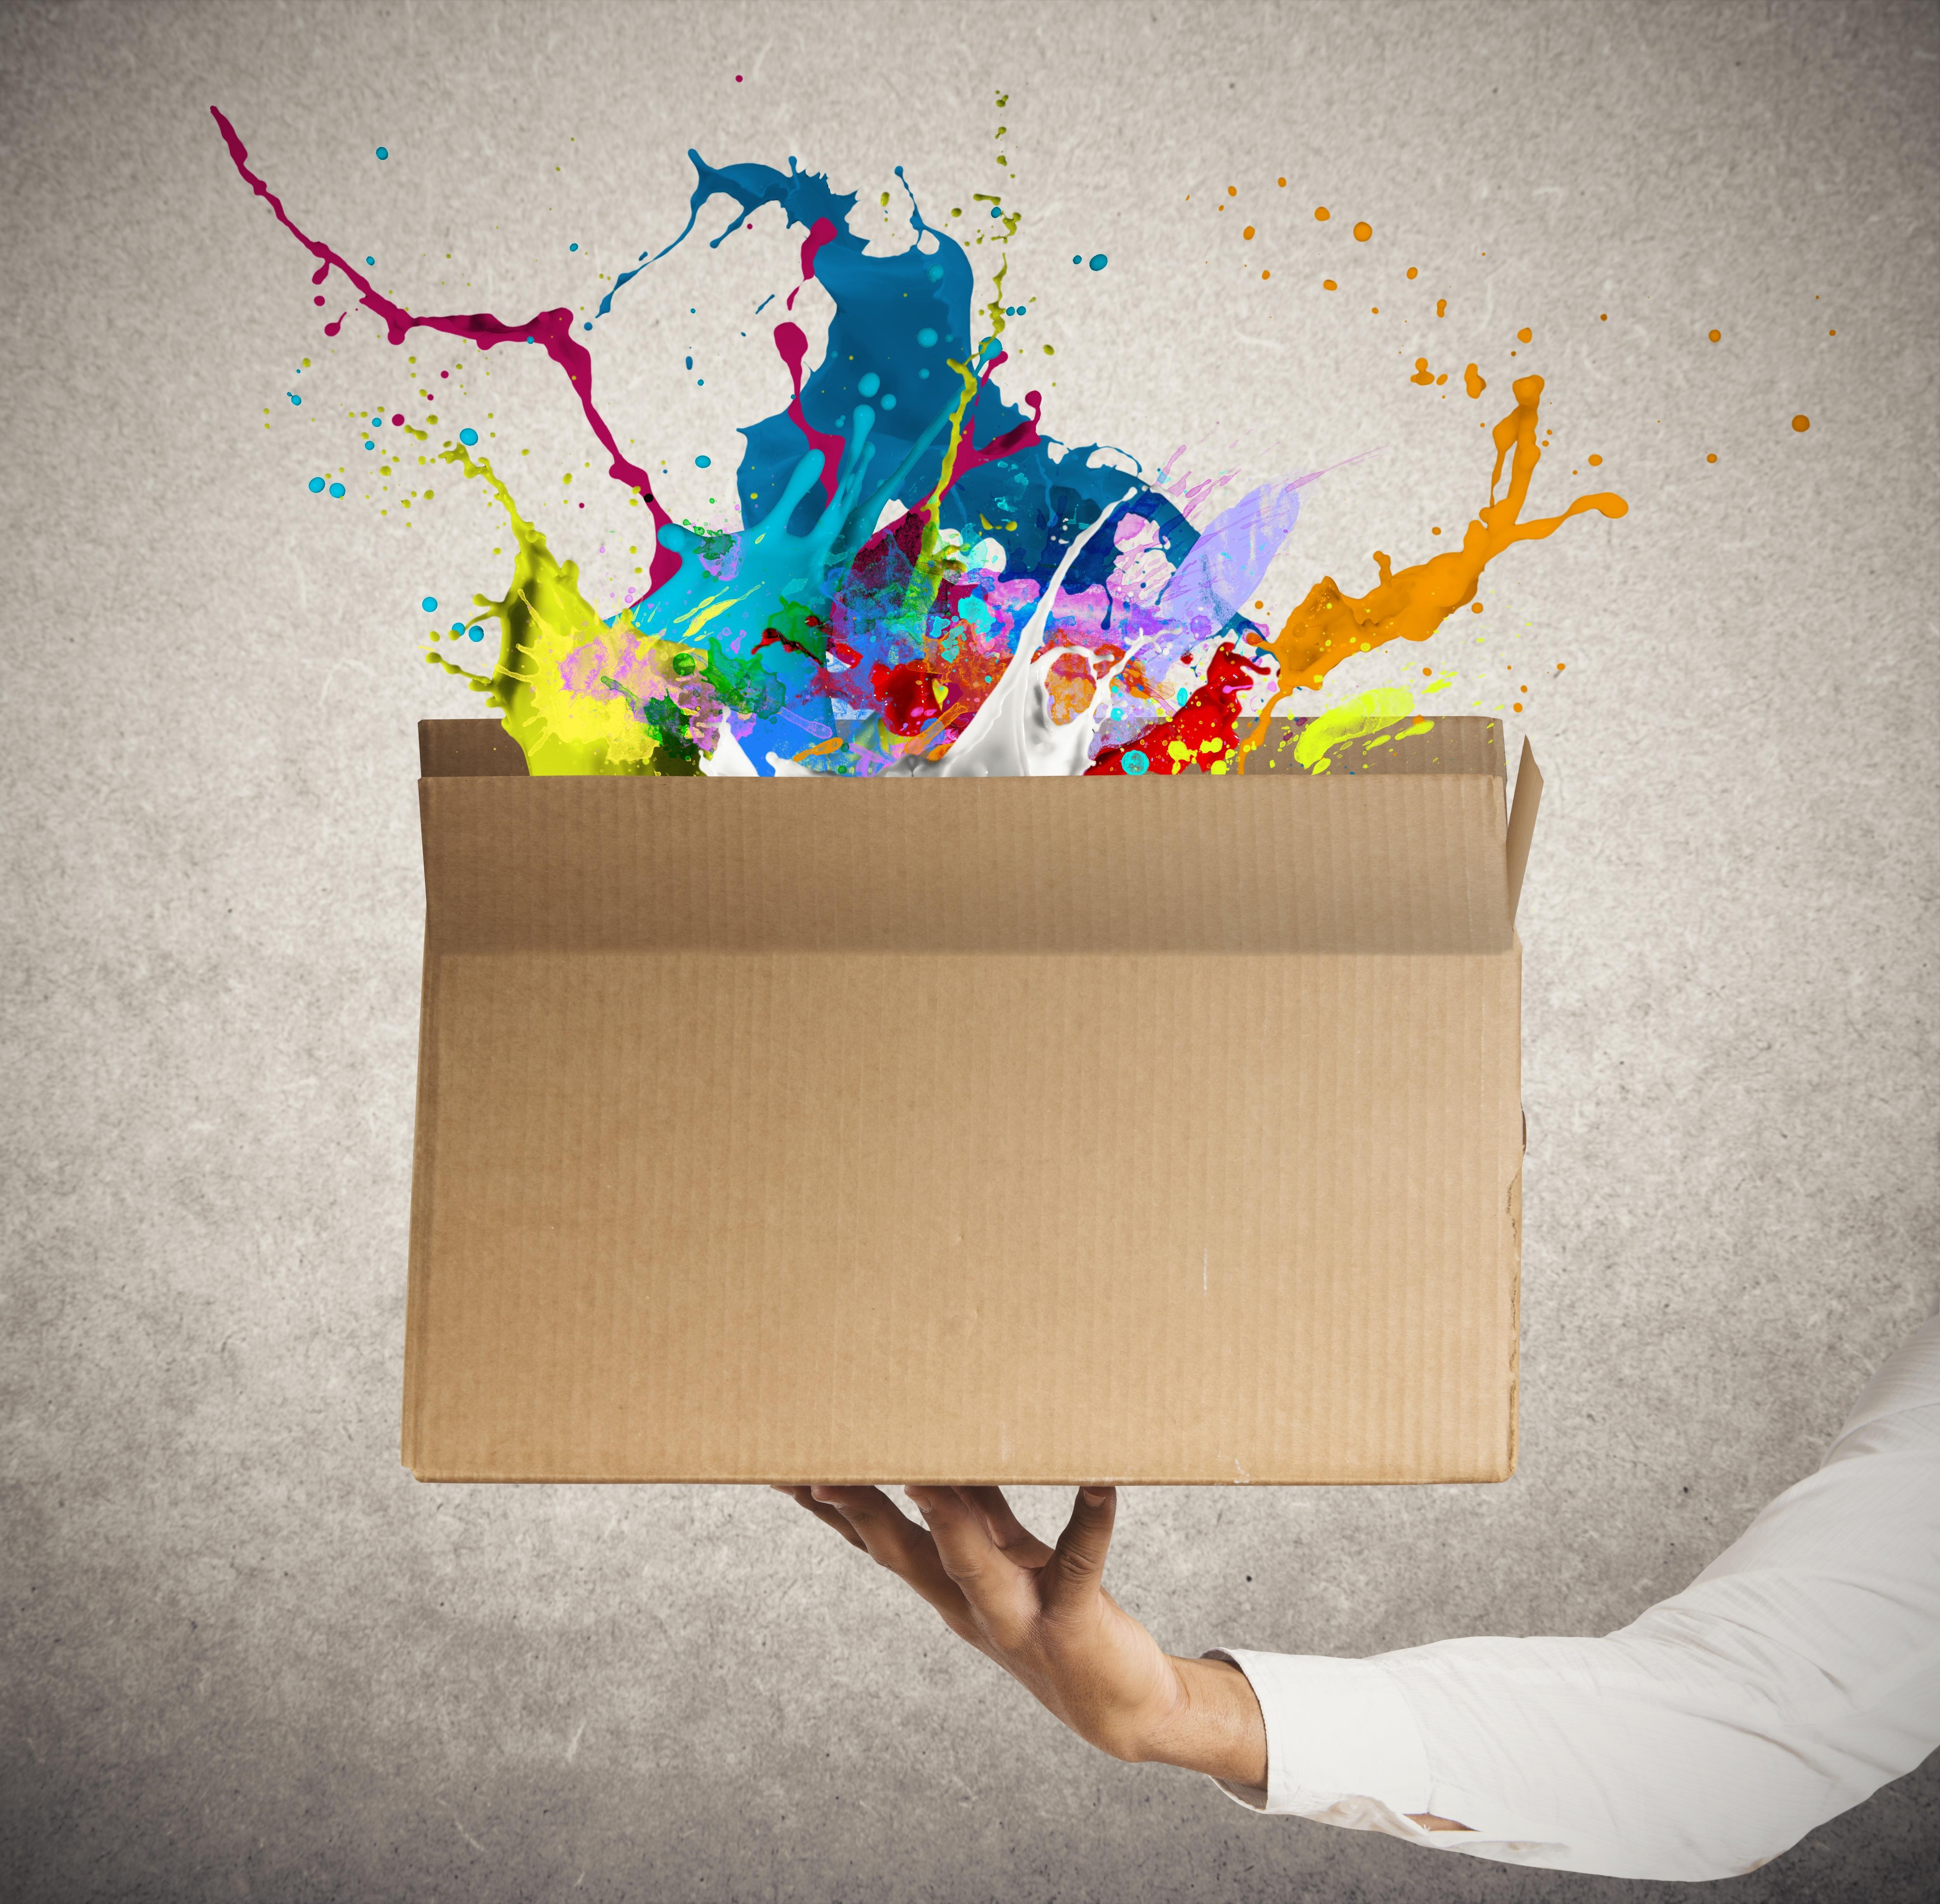 paint-splashing-box.jpg